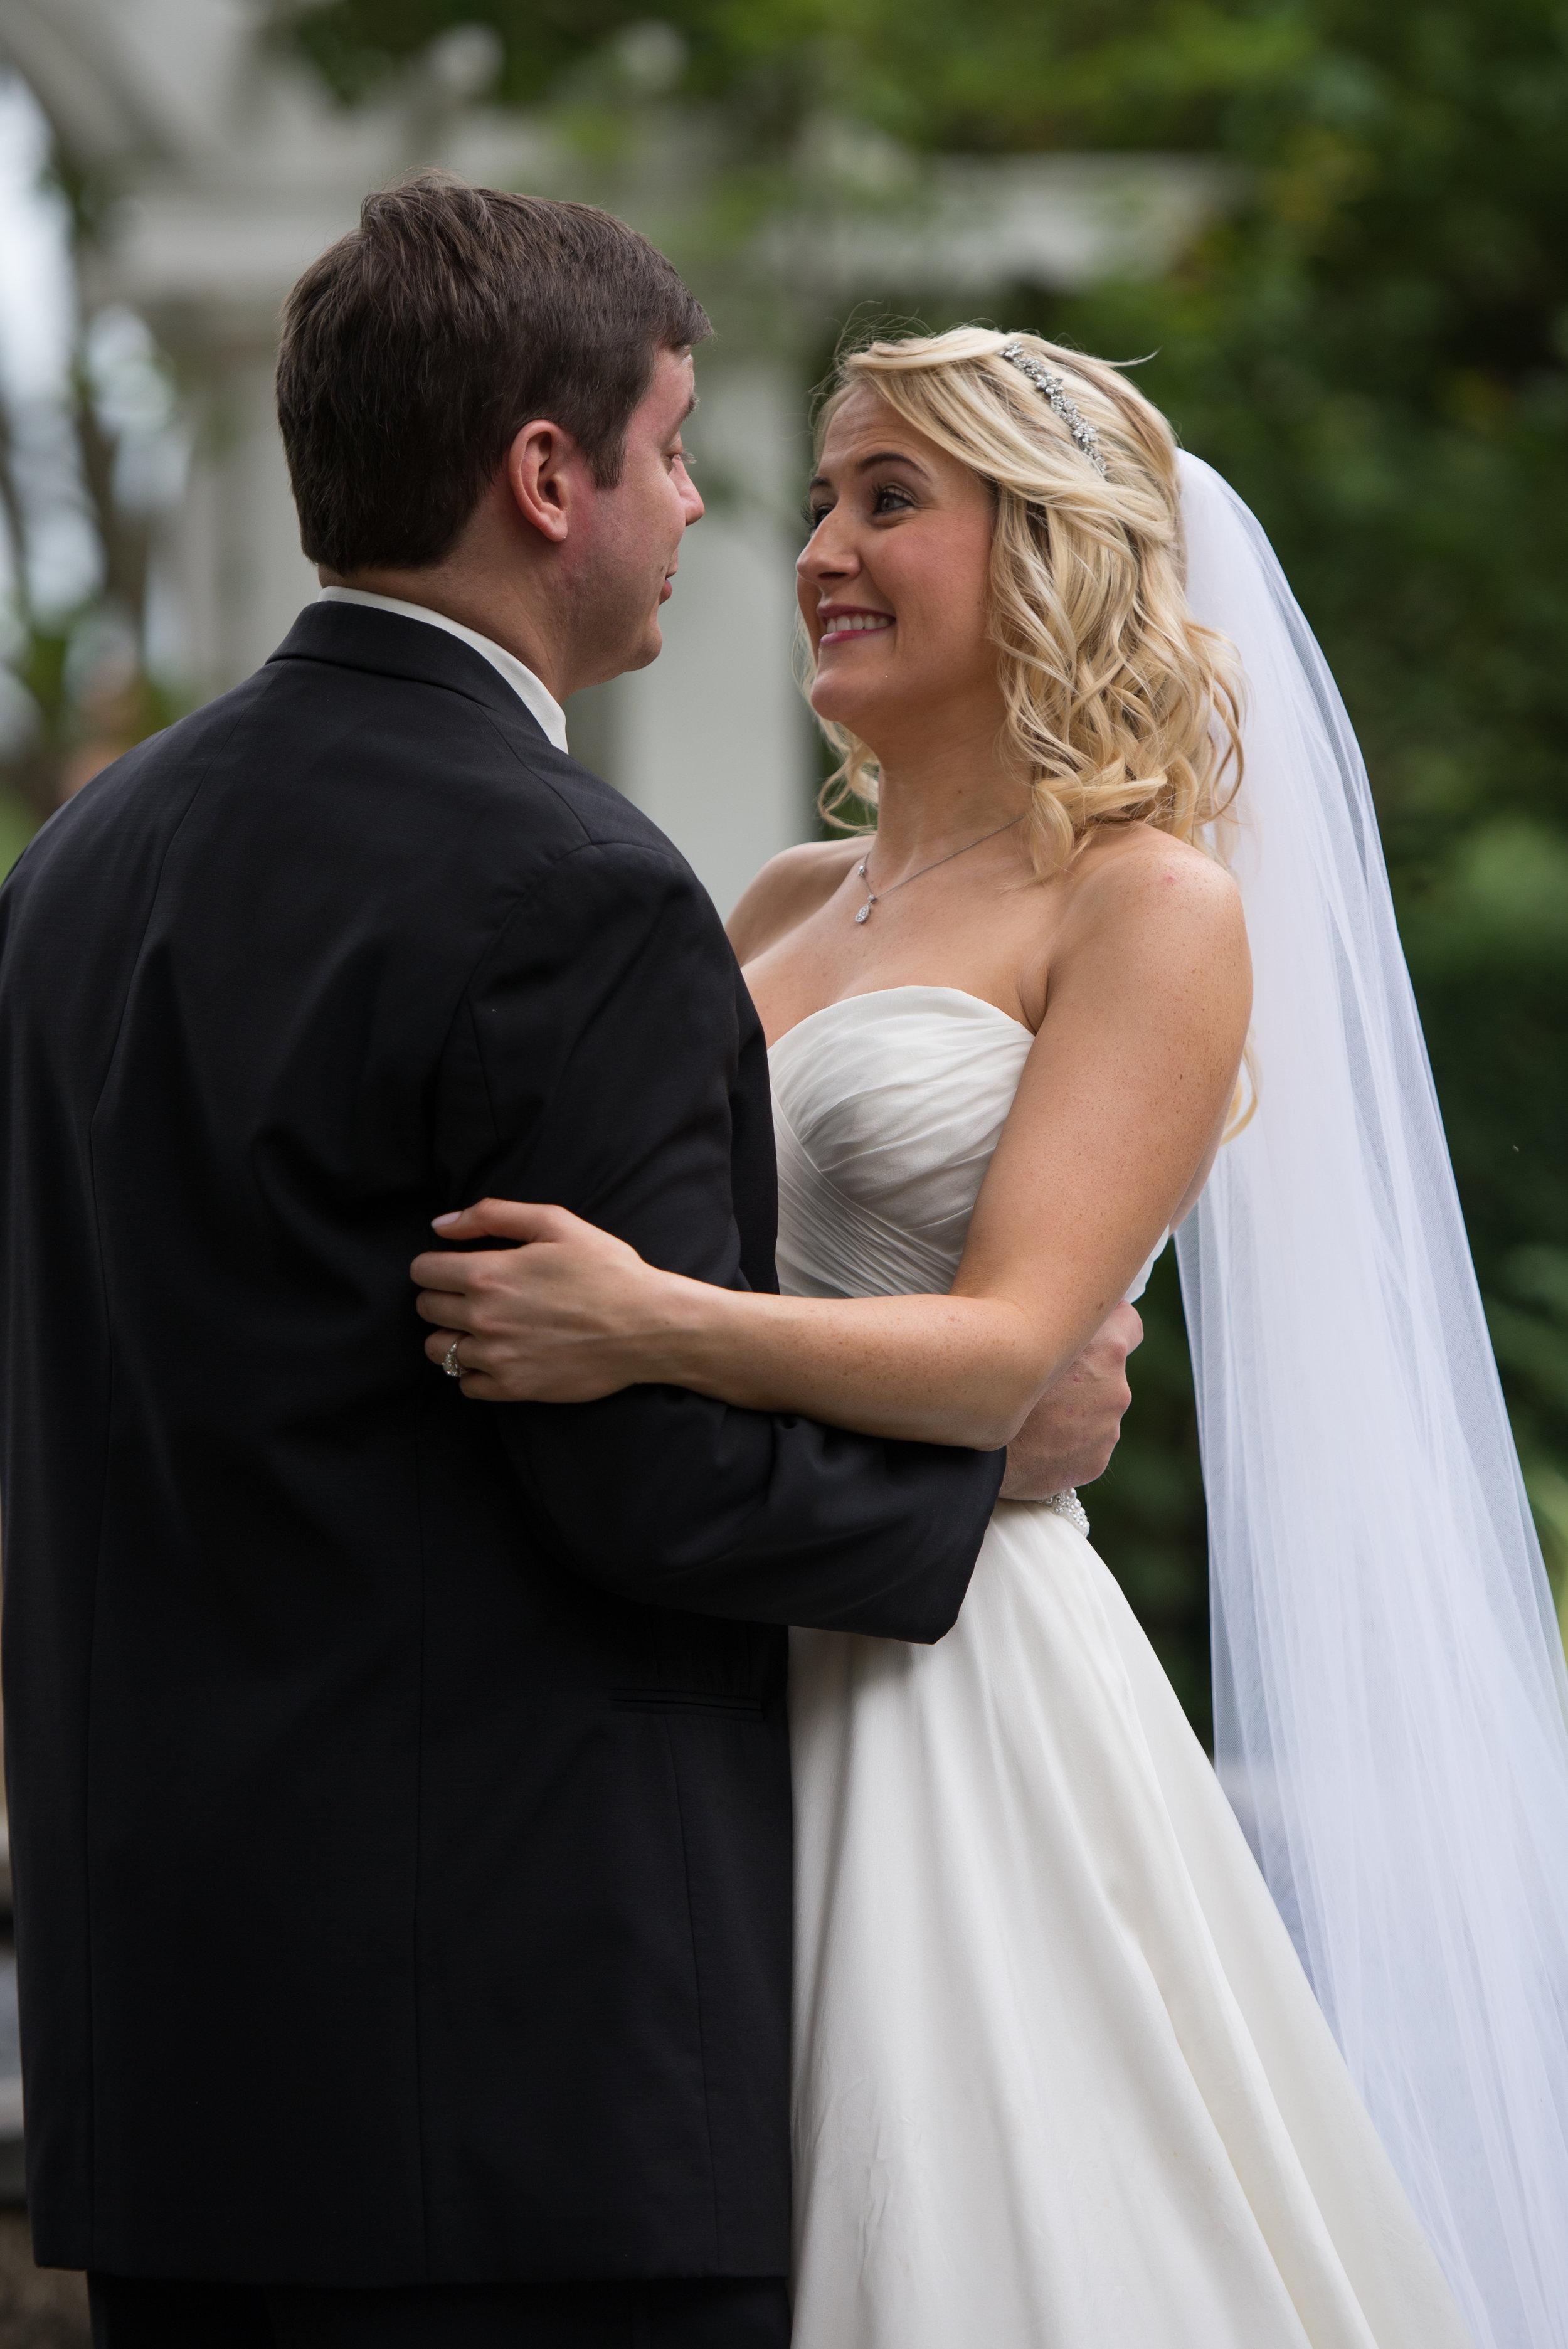 Wedding First Look Photos00934.jpg